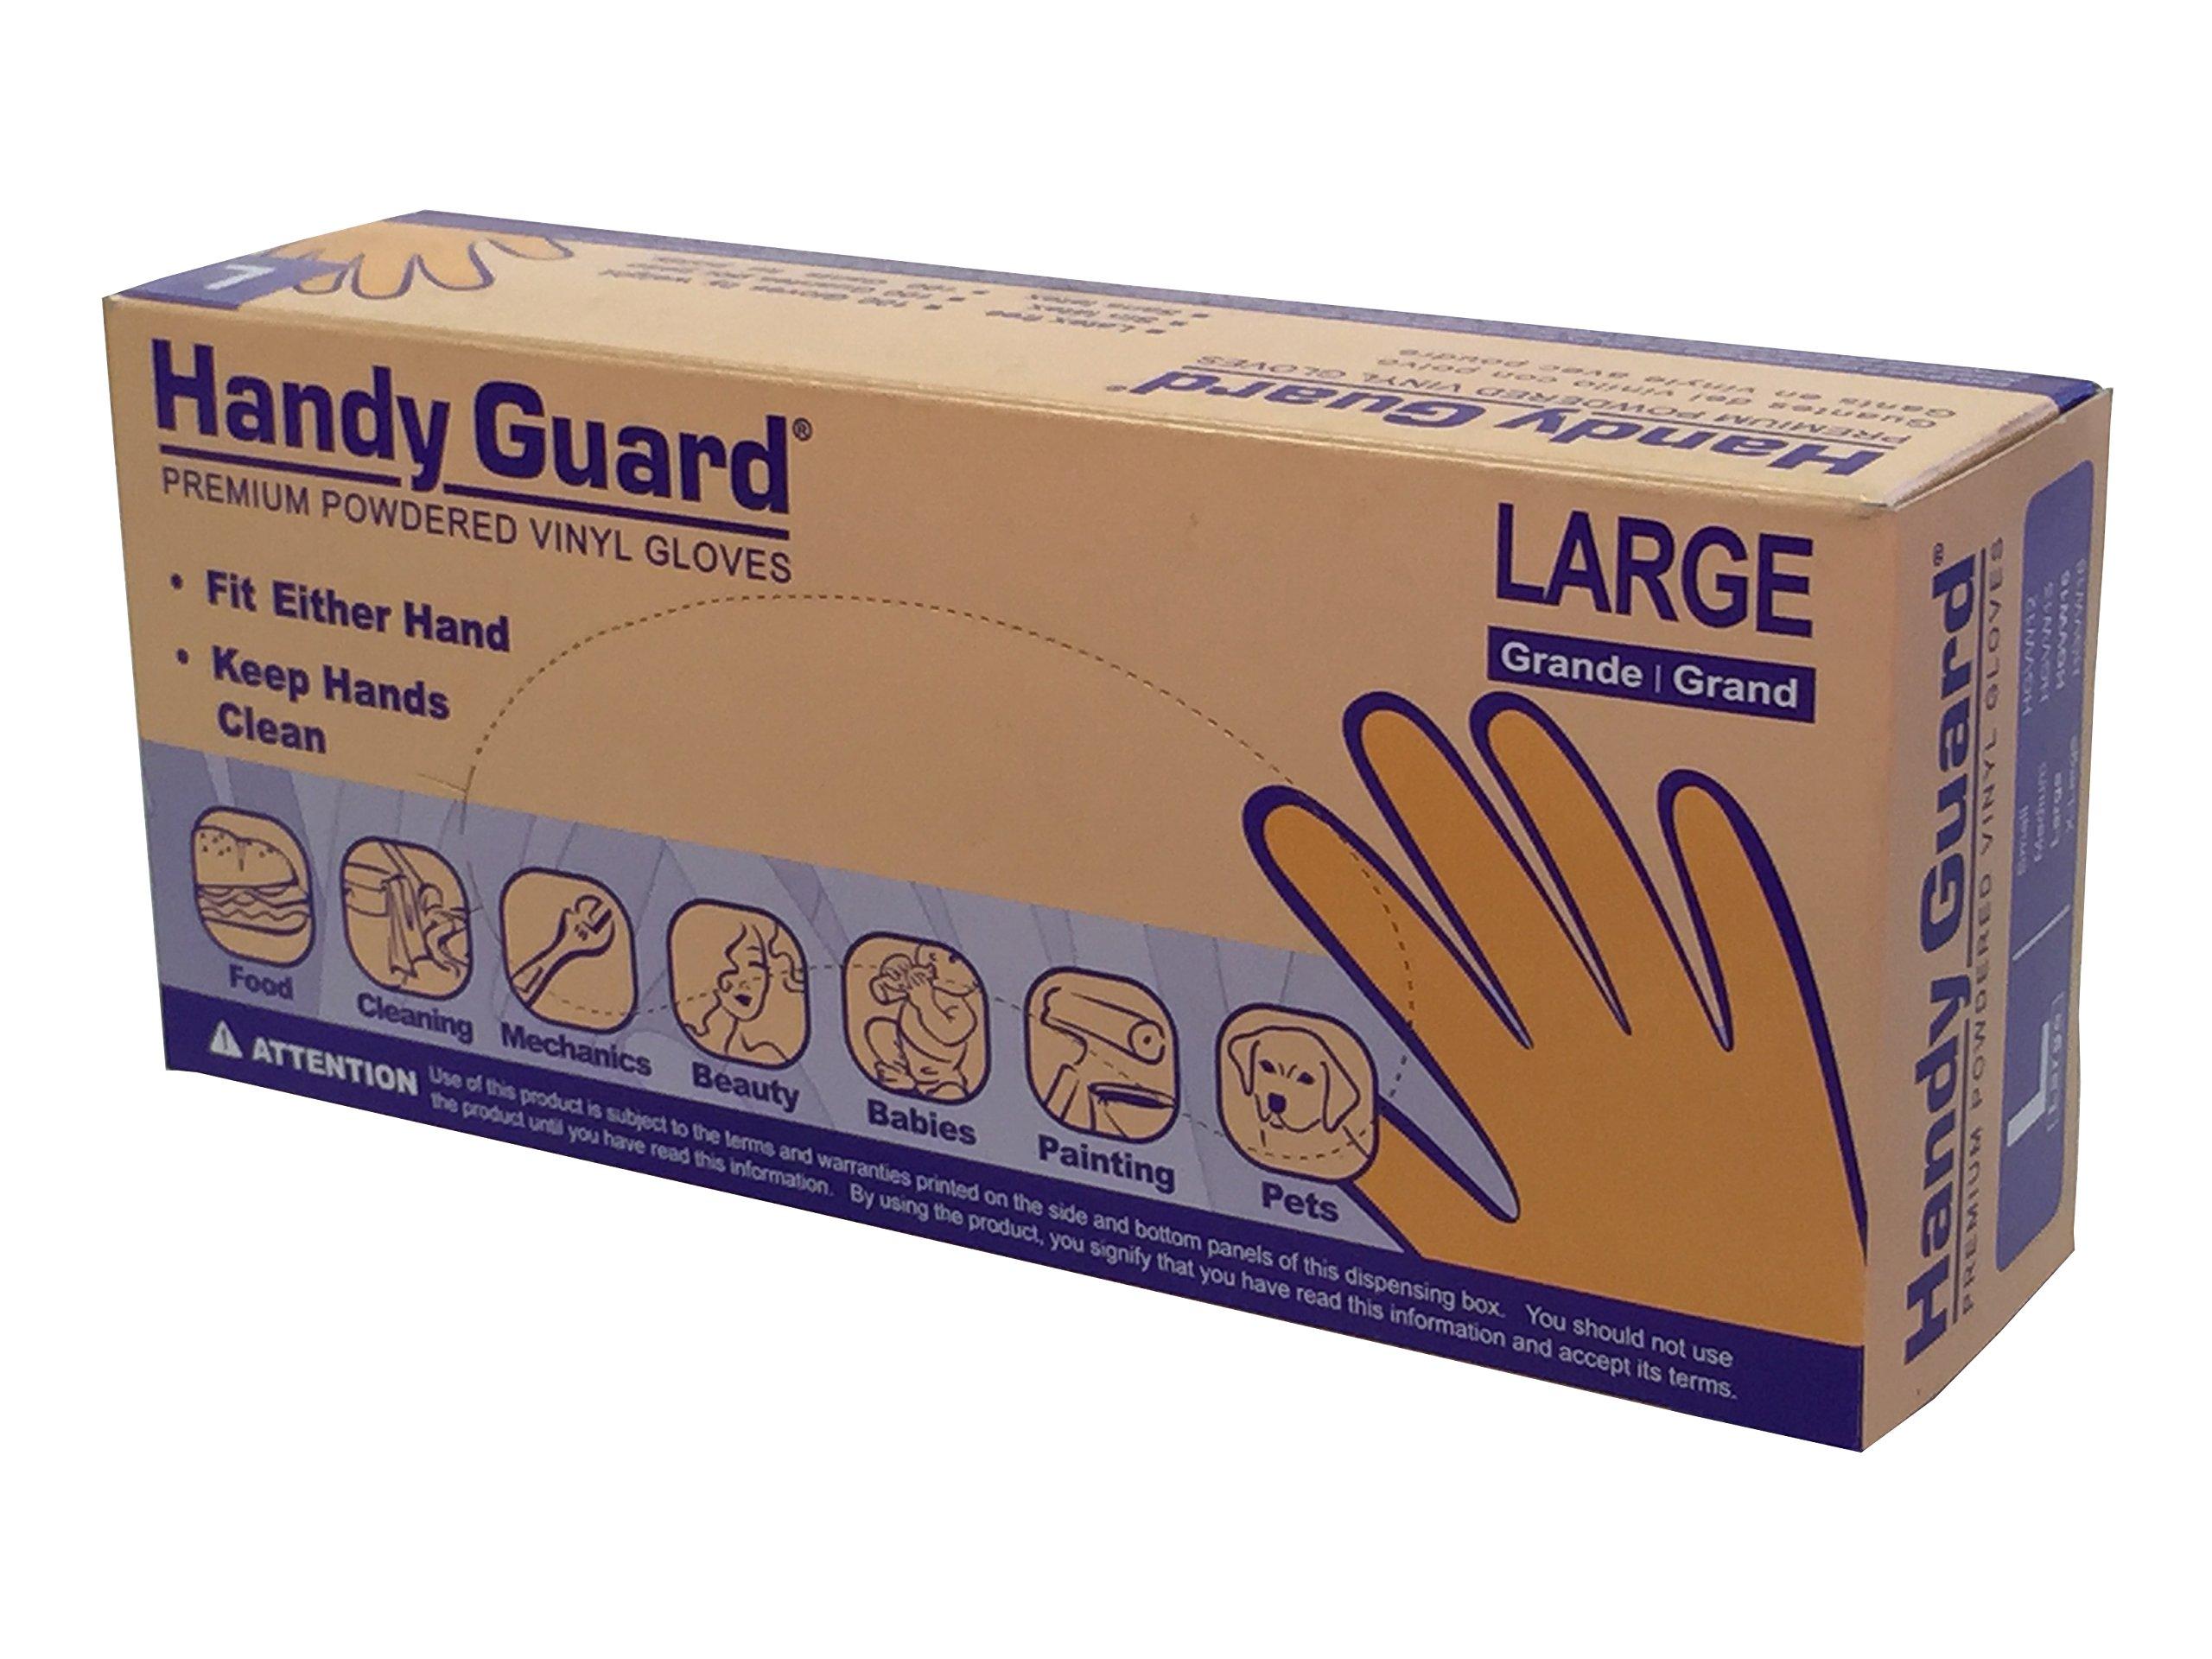 Adenna Handy Guard 3.5 mil Vinyl Powdered Gloves (Translucent, Large) Box of 100